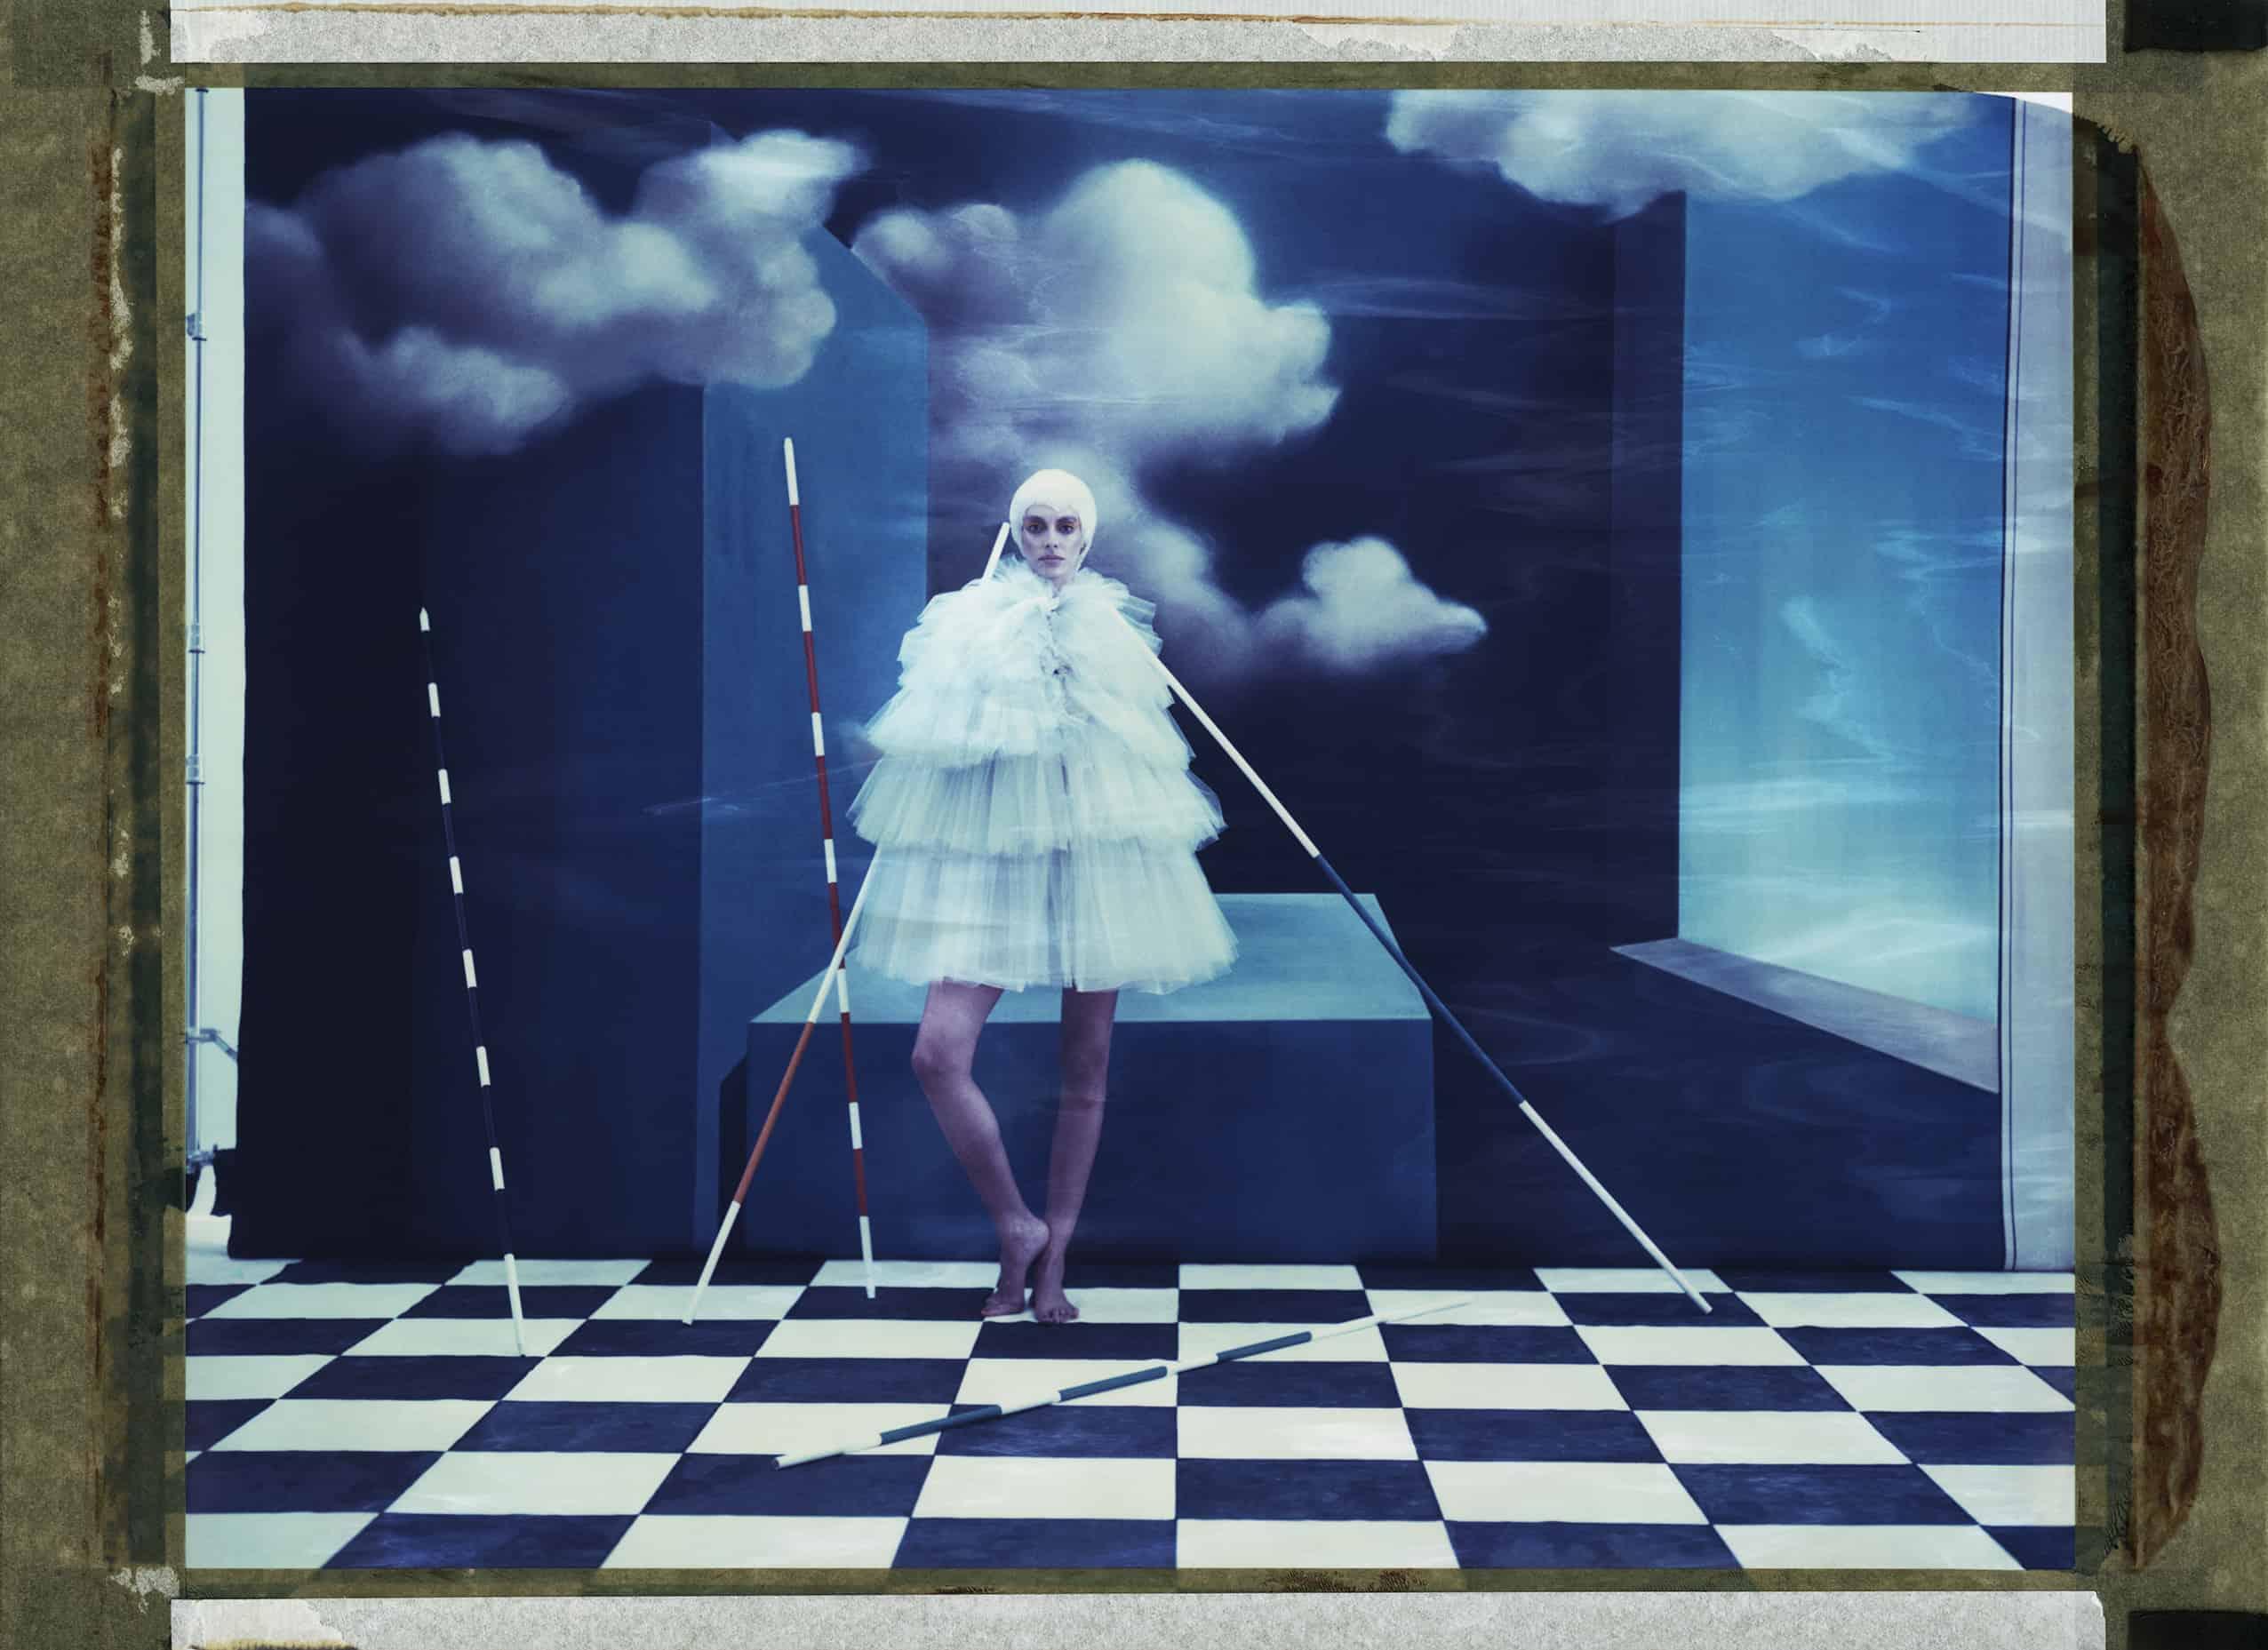 Giambattista Valli, handpainted backdrops Hommage to René Magritte. Cubism, surrealism, mikado sticks , photo studio,